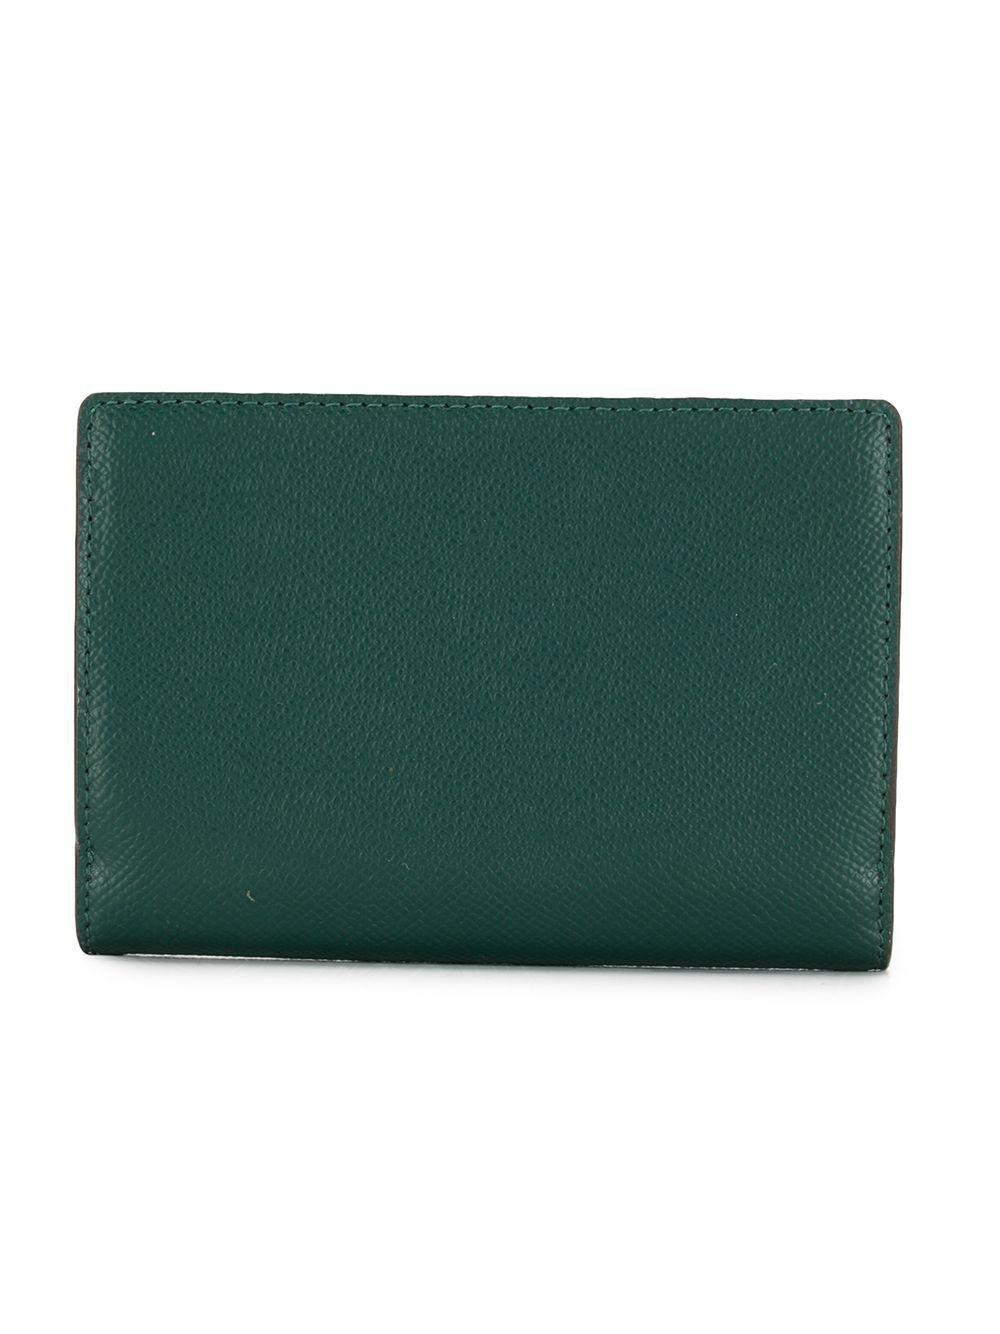 3e10201e0d43 MICHAEL Michael Kors Jet Set Slim Wallet in Green - Save 1% - Lyst